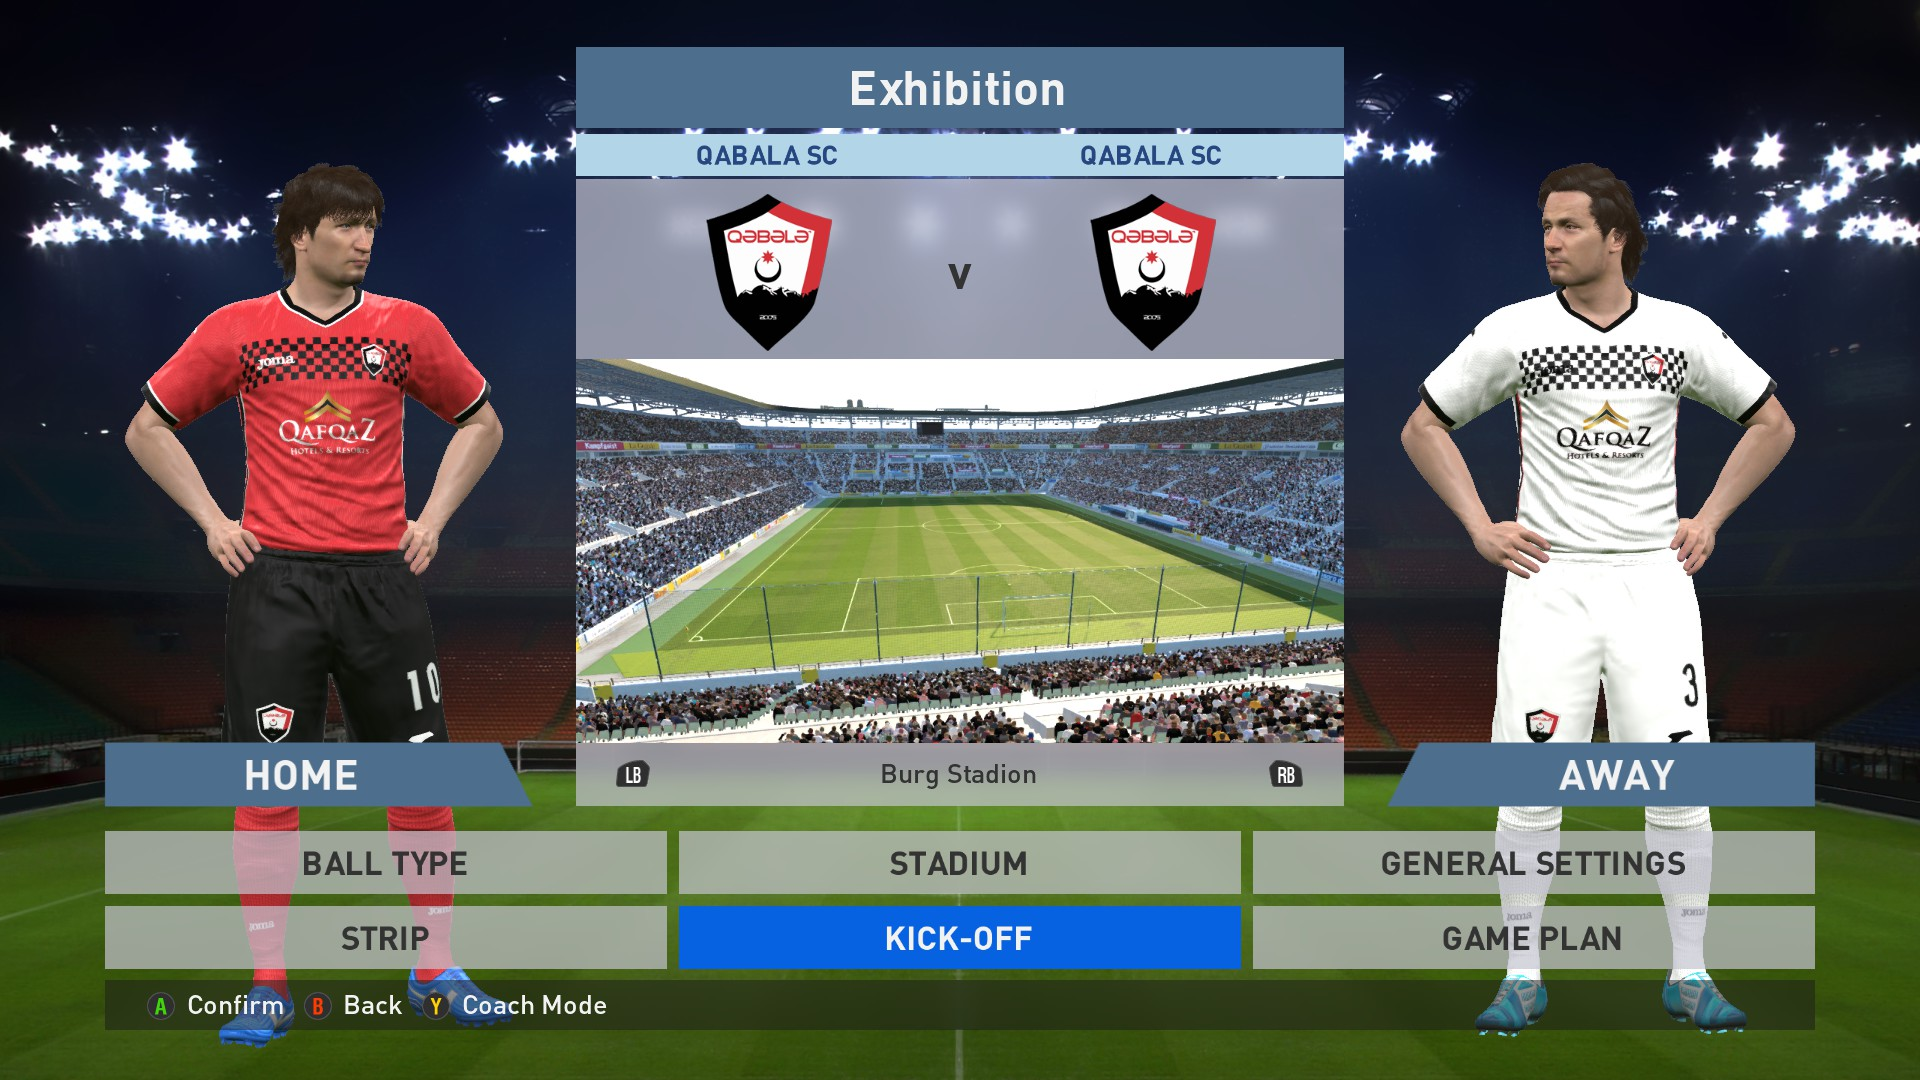 1f556ca8ff3 Qabala FC Home Away kits image -  PES-16  Megaforce teams Add-On mod ...